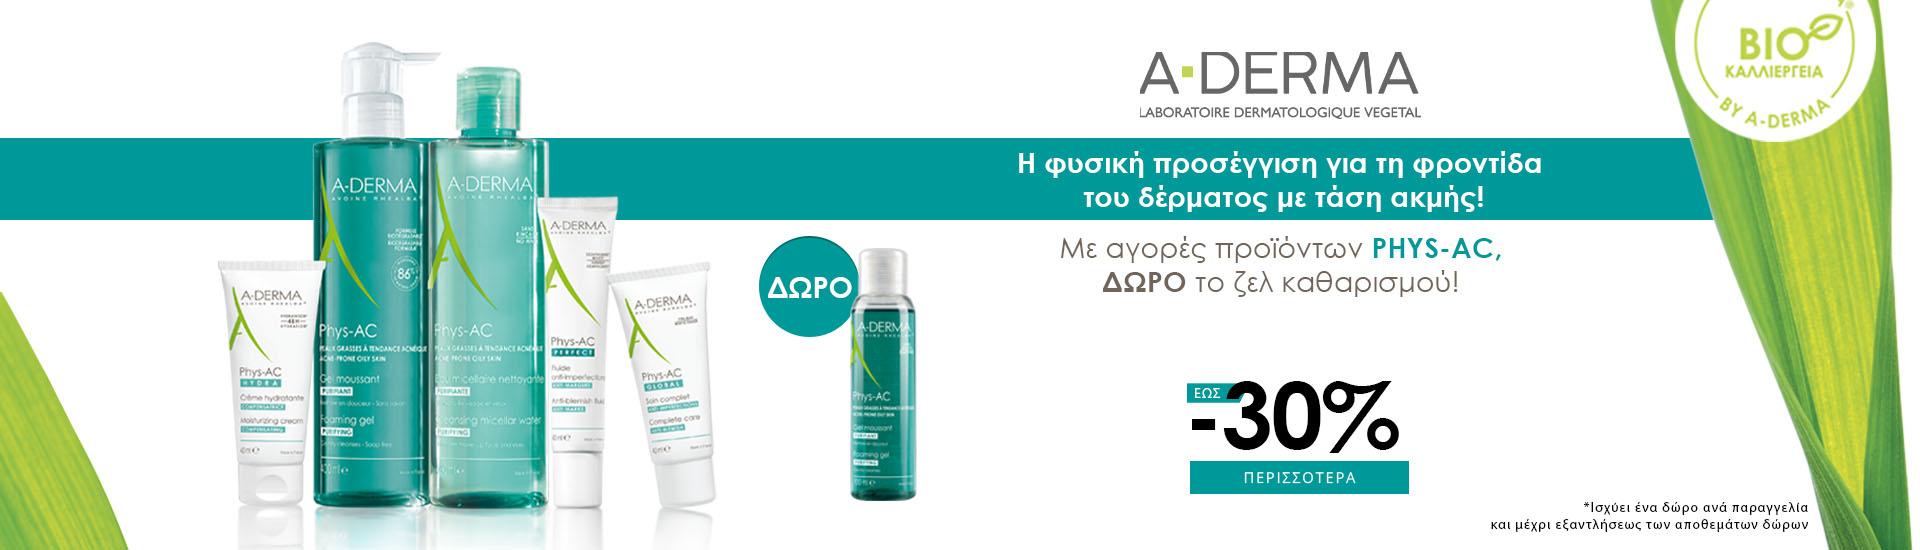 A-Derma Phys-AC έως -30% & ΔΩΡΟ